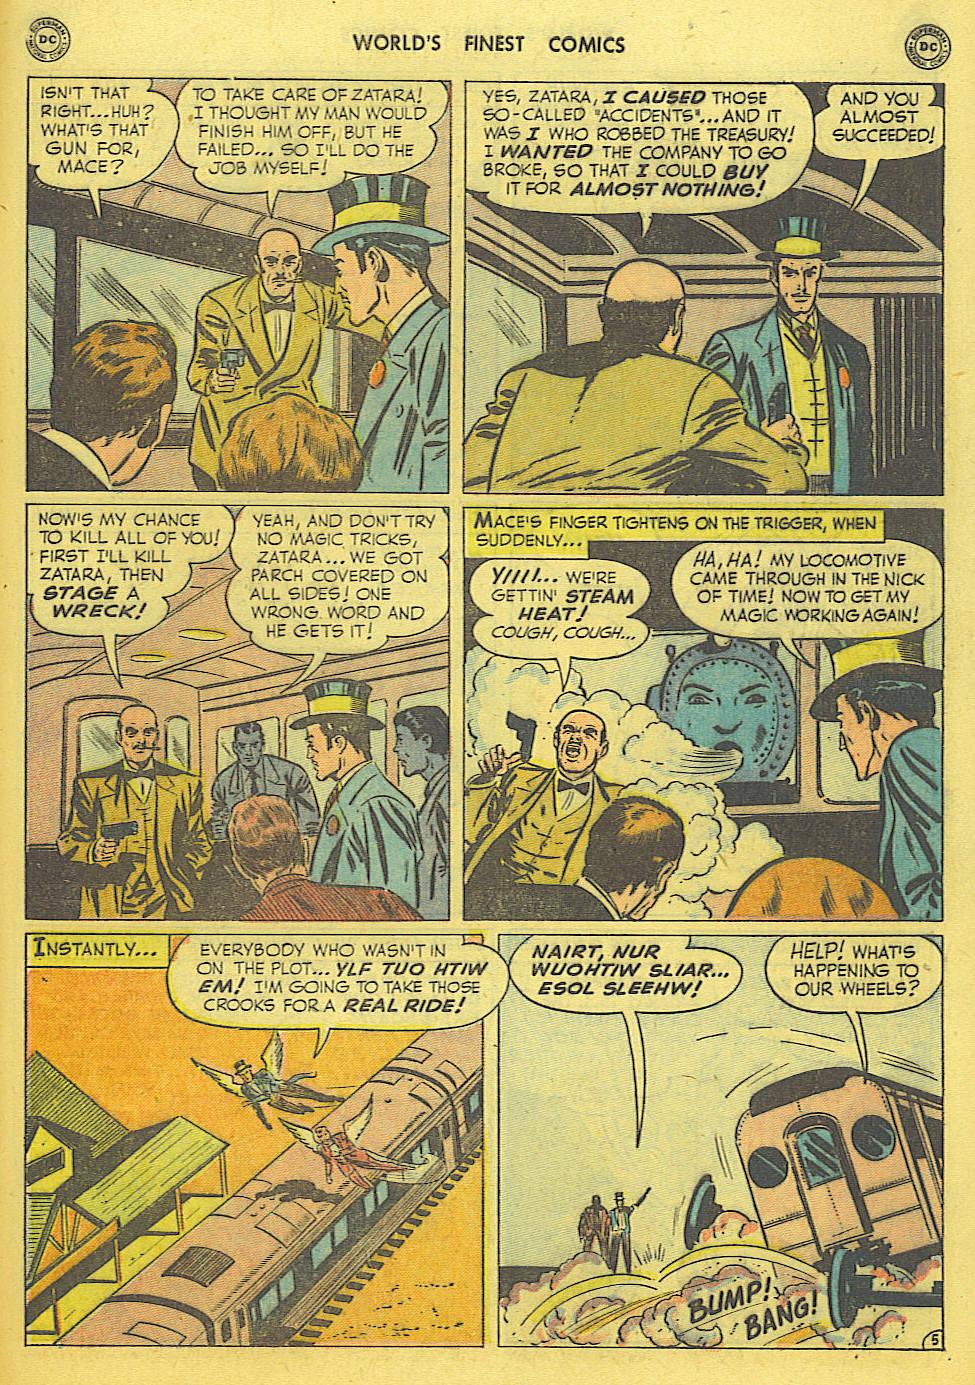 Read online World's Finest Comics comic -  Issue #49 - 56